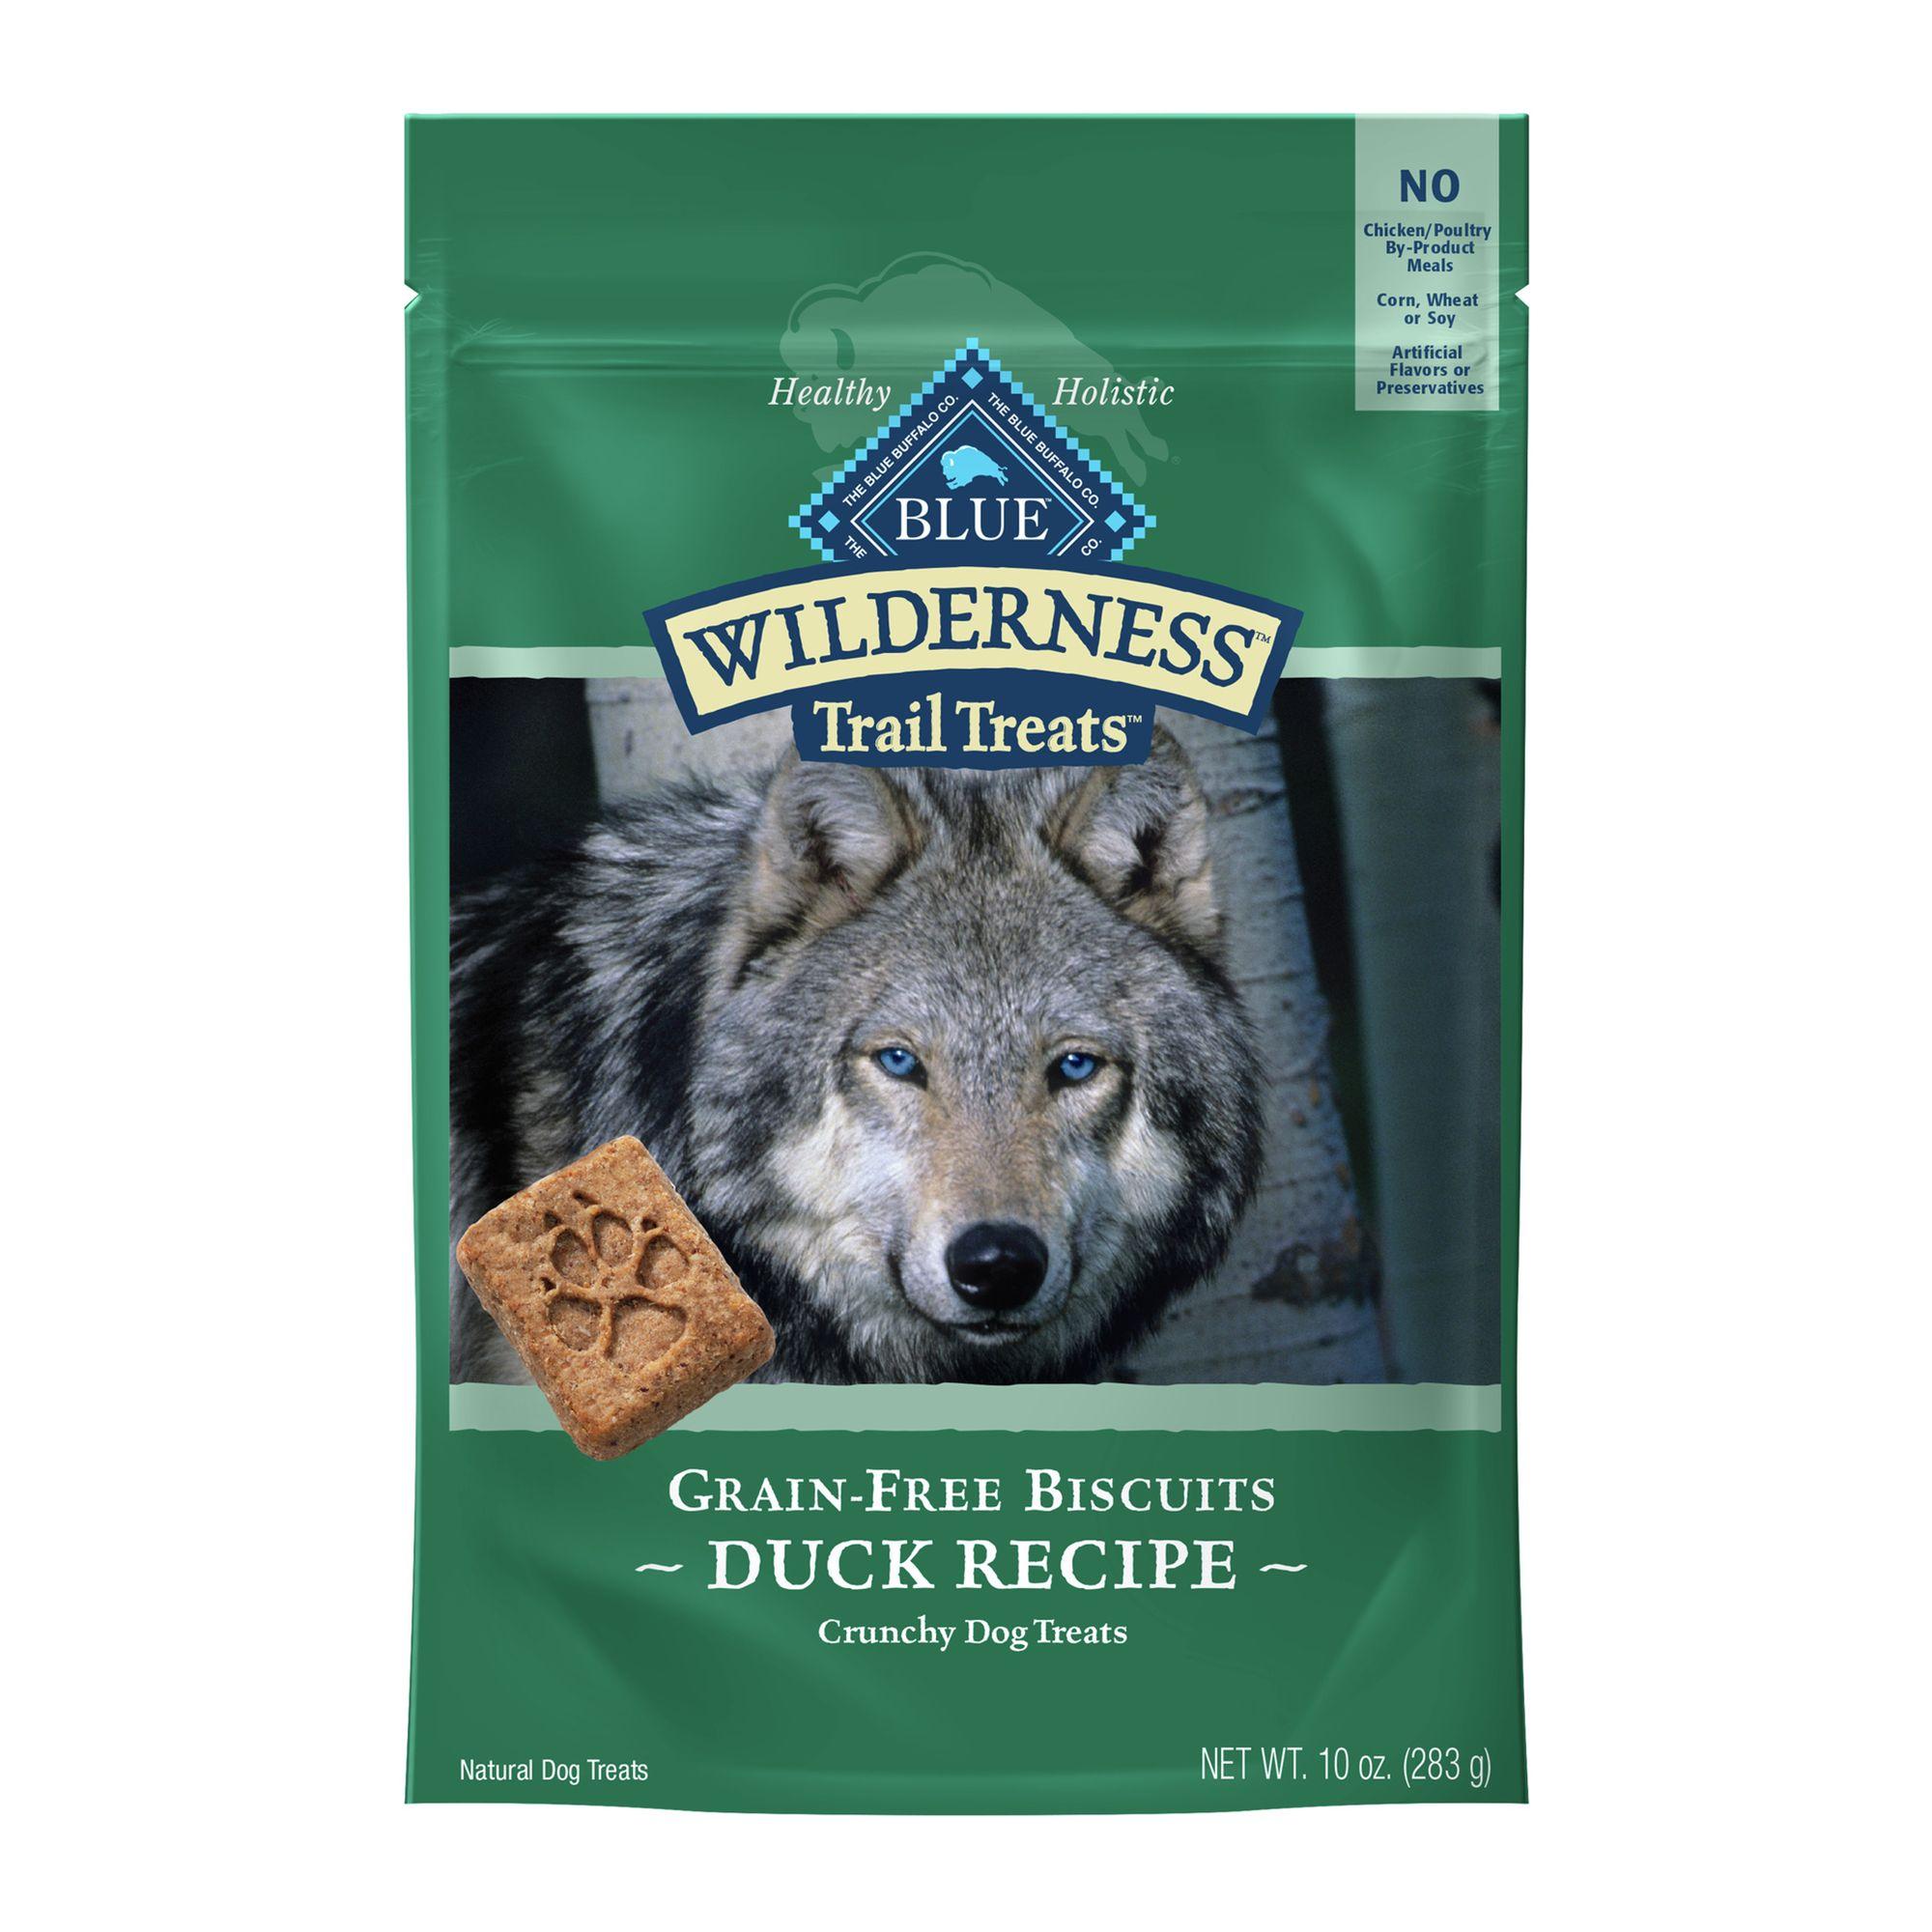 Blue Wilderness Trail Treats Grain Free Dog Treat size: 10 Oz, Blue Buffalo, Duck, Adult